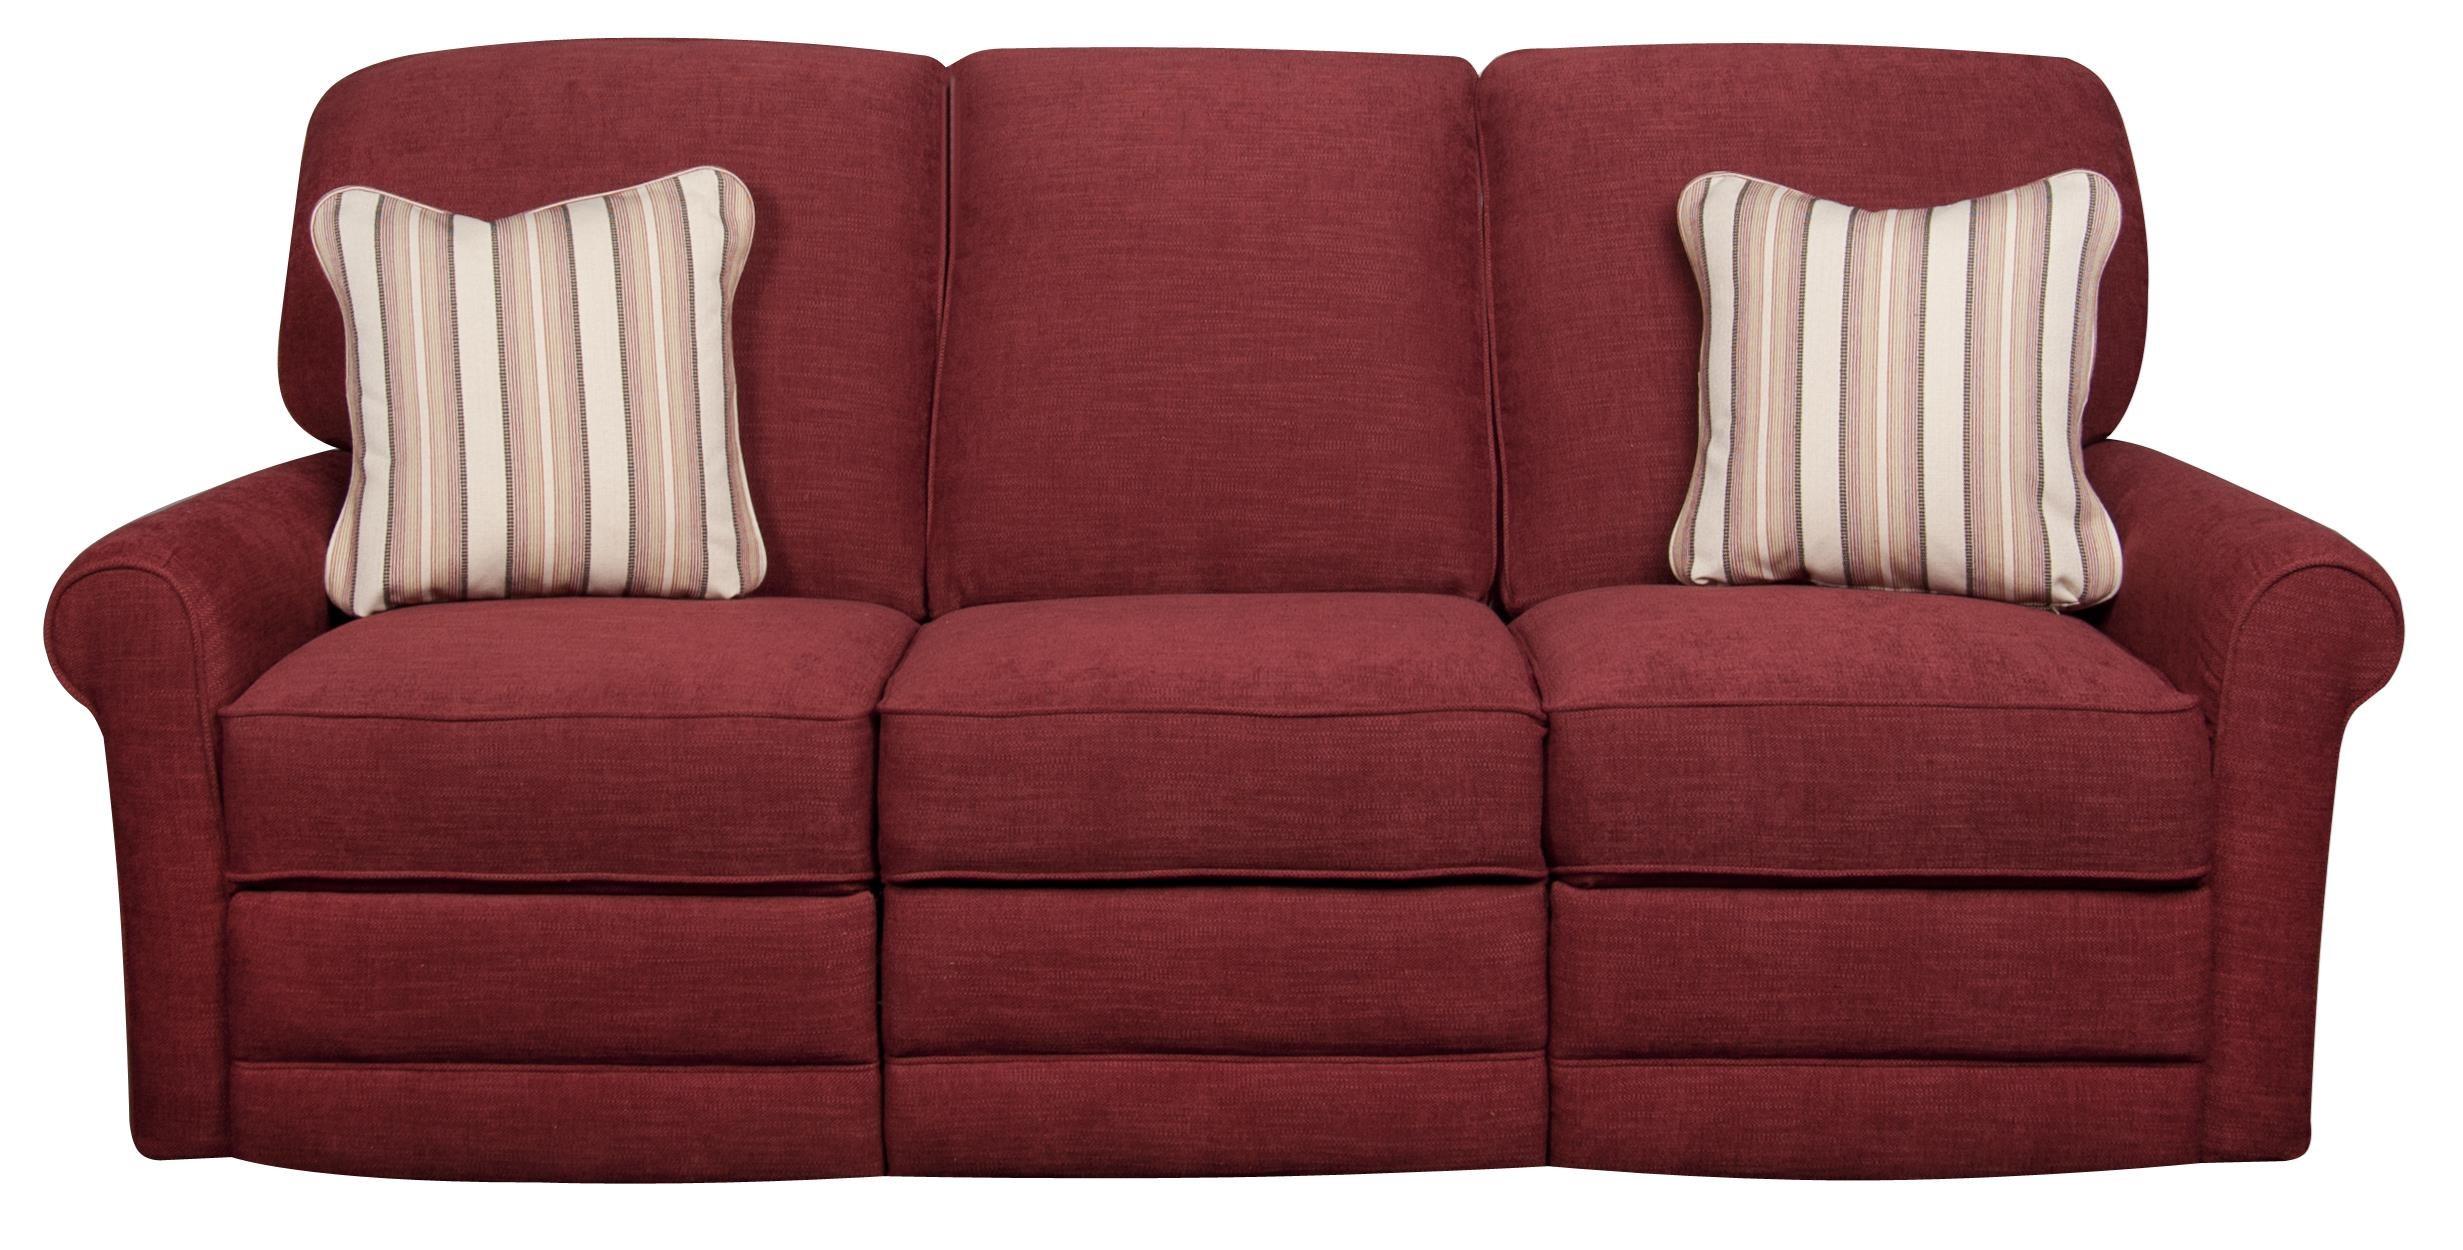 La-Z-Boy Addison Addison Reclining Sofa - Item Number: 366608811